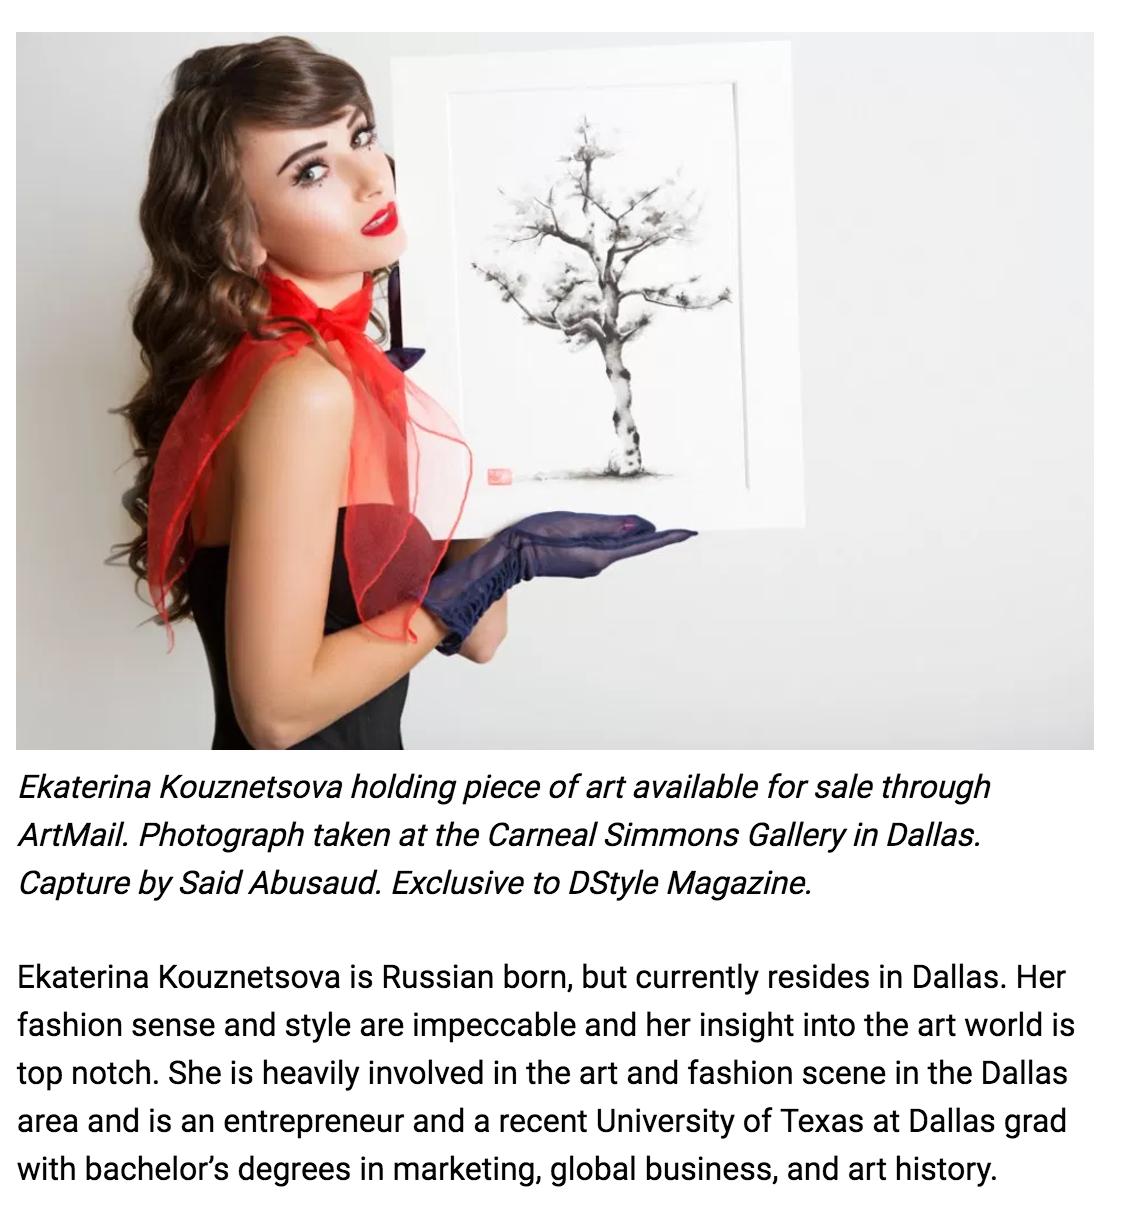 D Style Magazine, August 2017